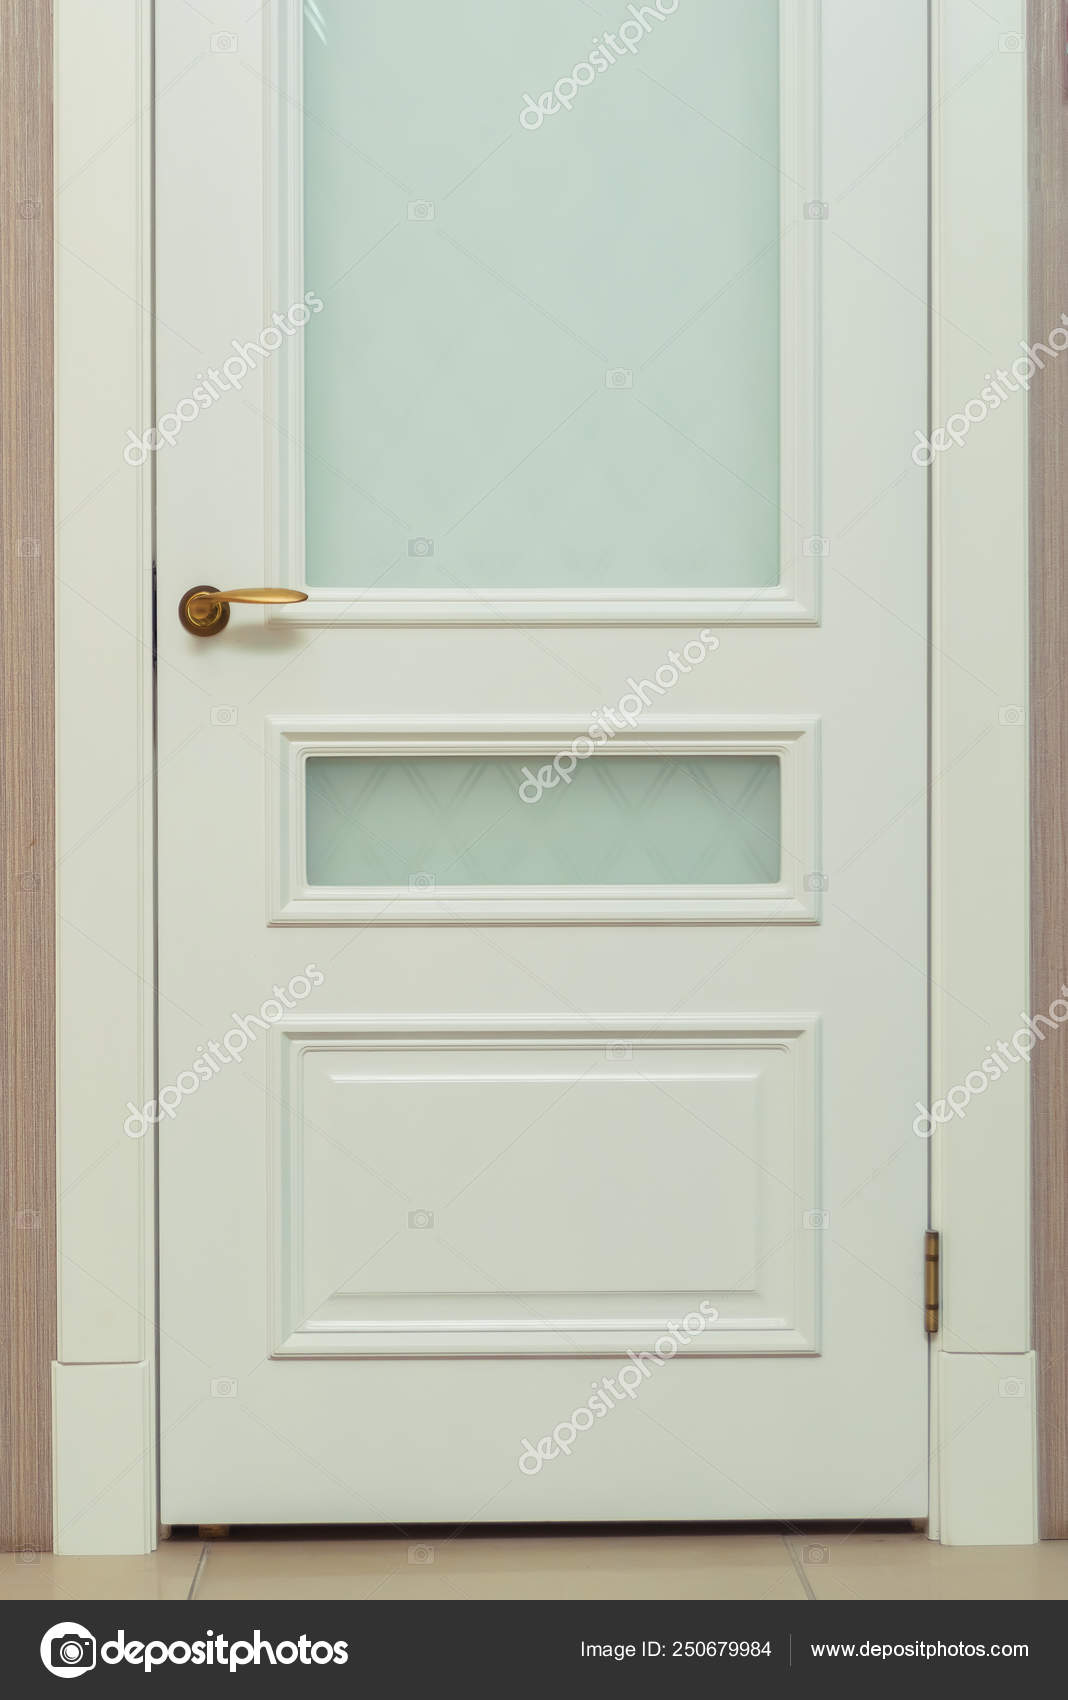 Glass Doors Designs Interior White Door Classic Design Interior Door Modern Door Platband Glass Stock Photo C Kinderkz 250679984